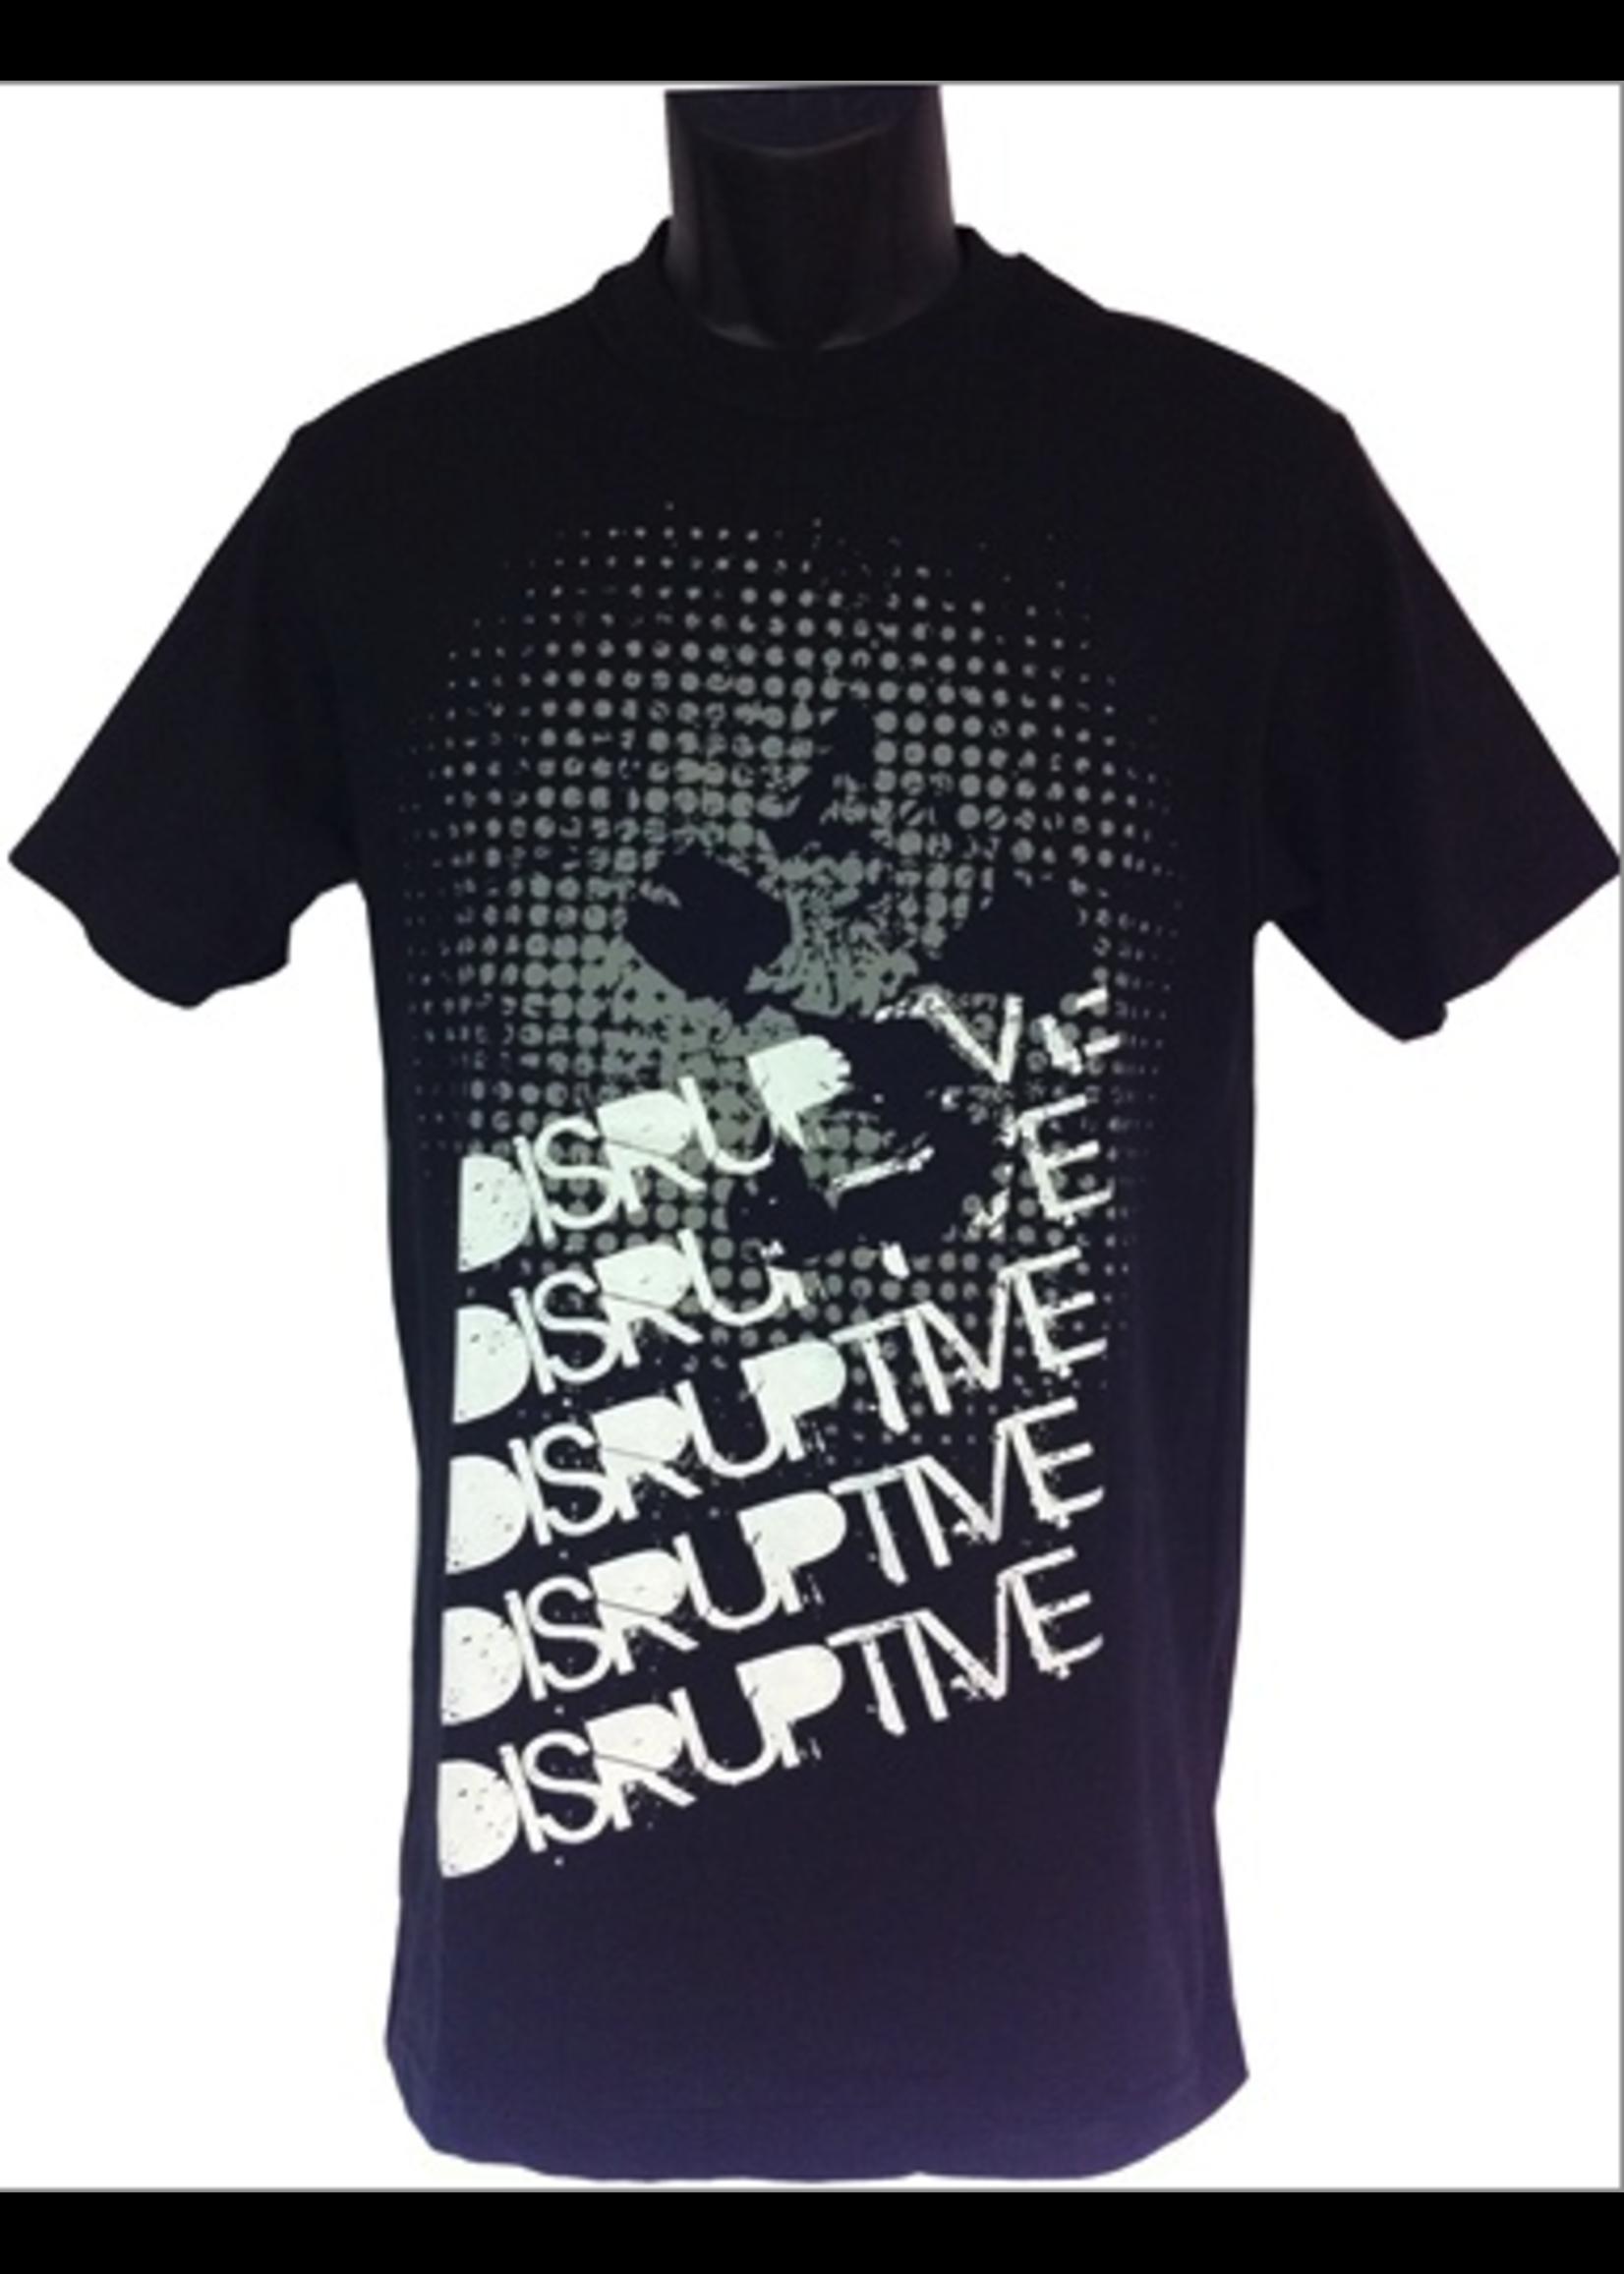 Disruptive Products SIGNATURE T-SHIRT